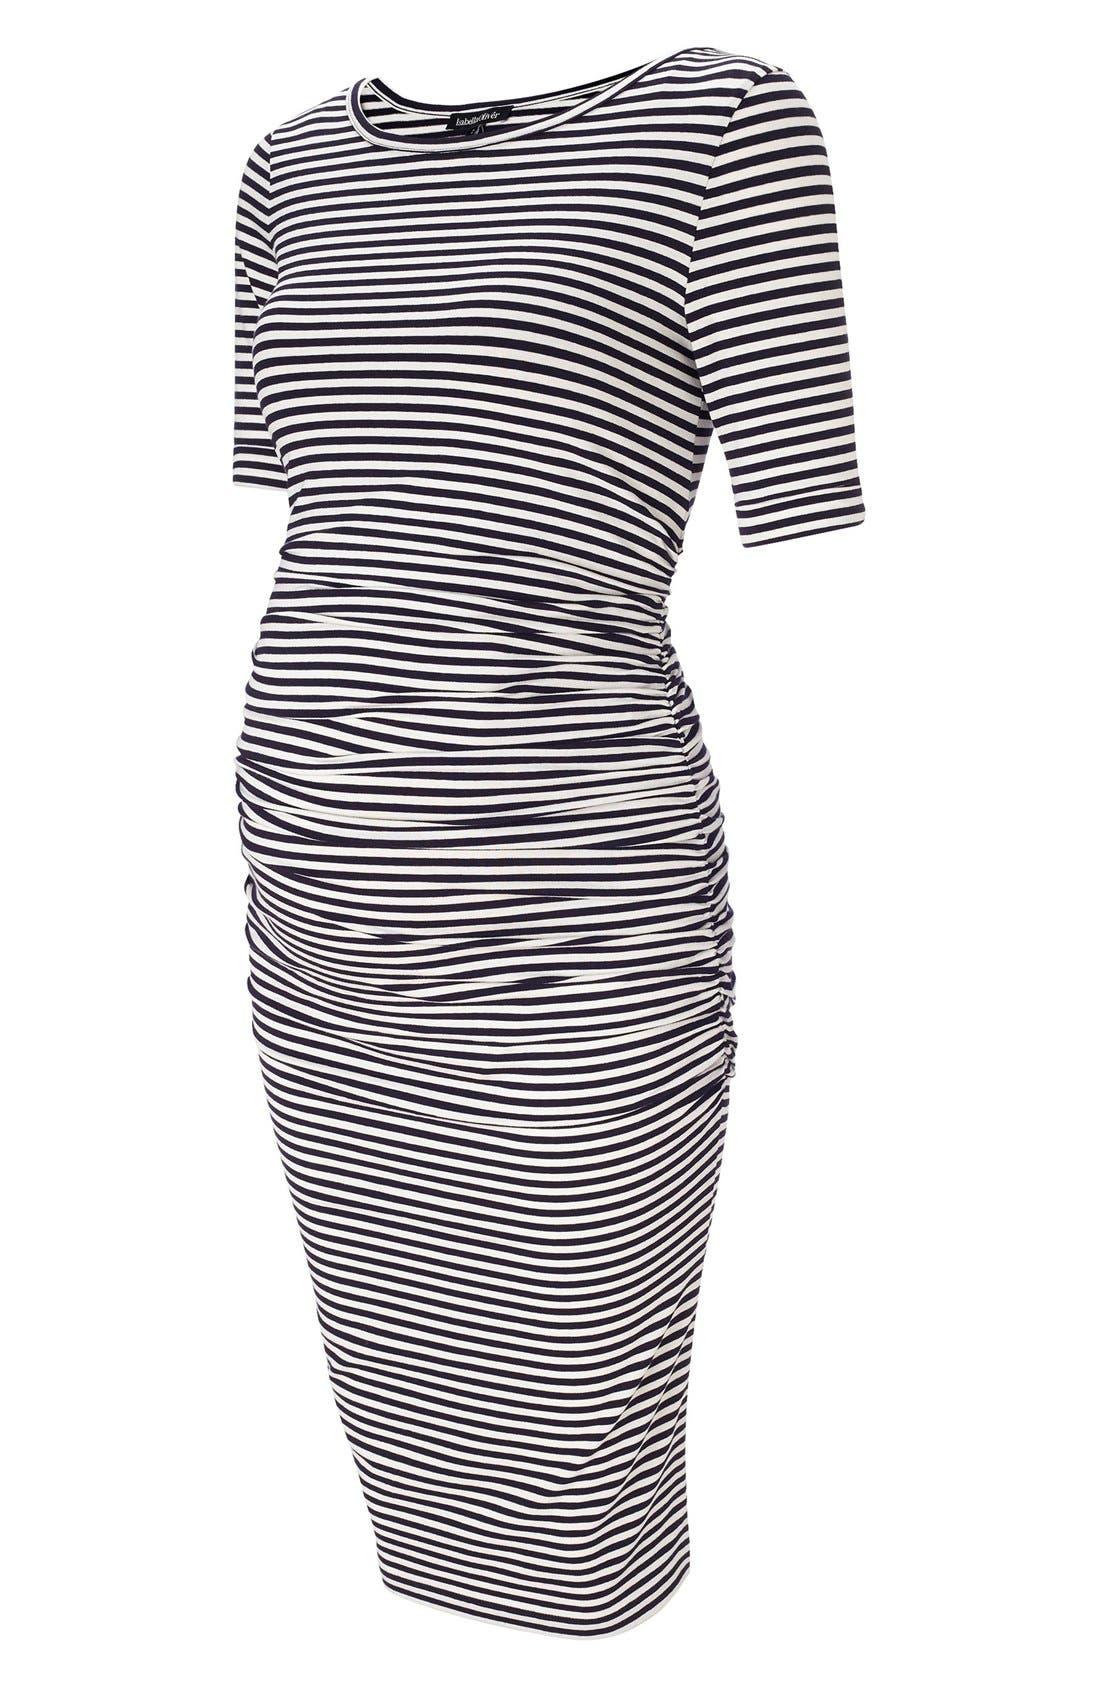 Isabella Oliver Arlington Stripe Maternity Dress